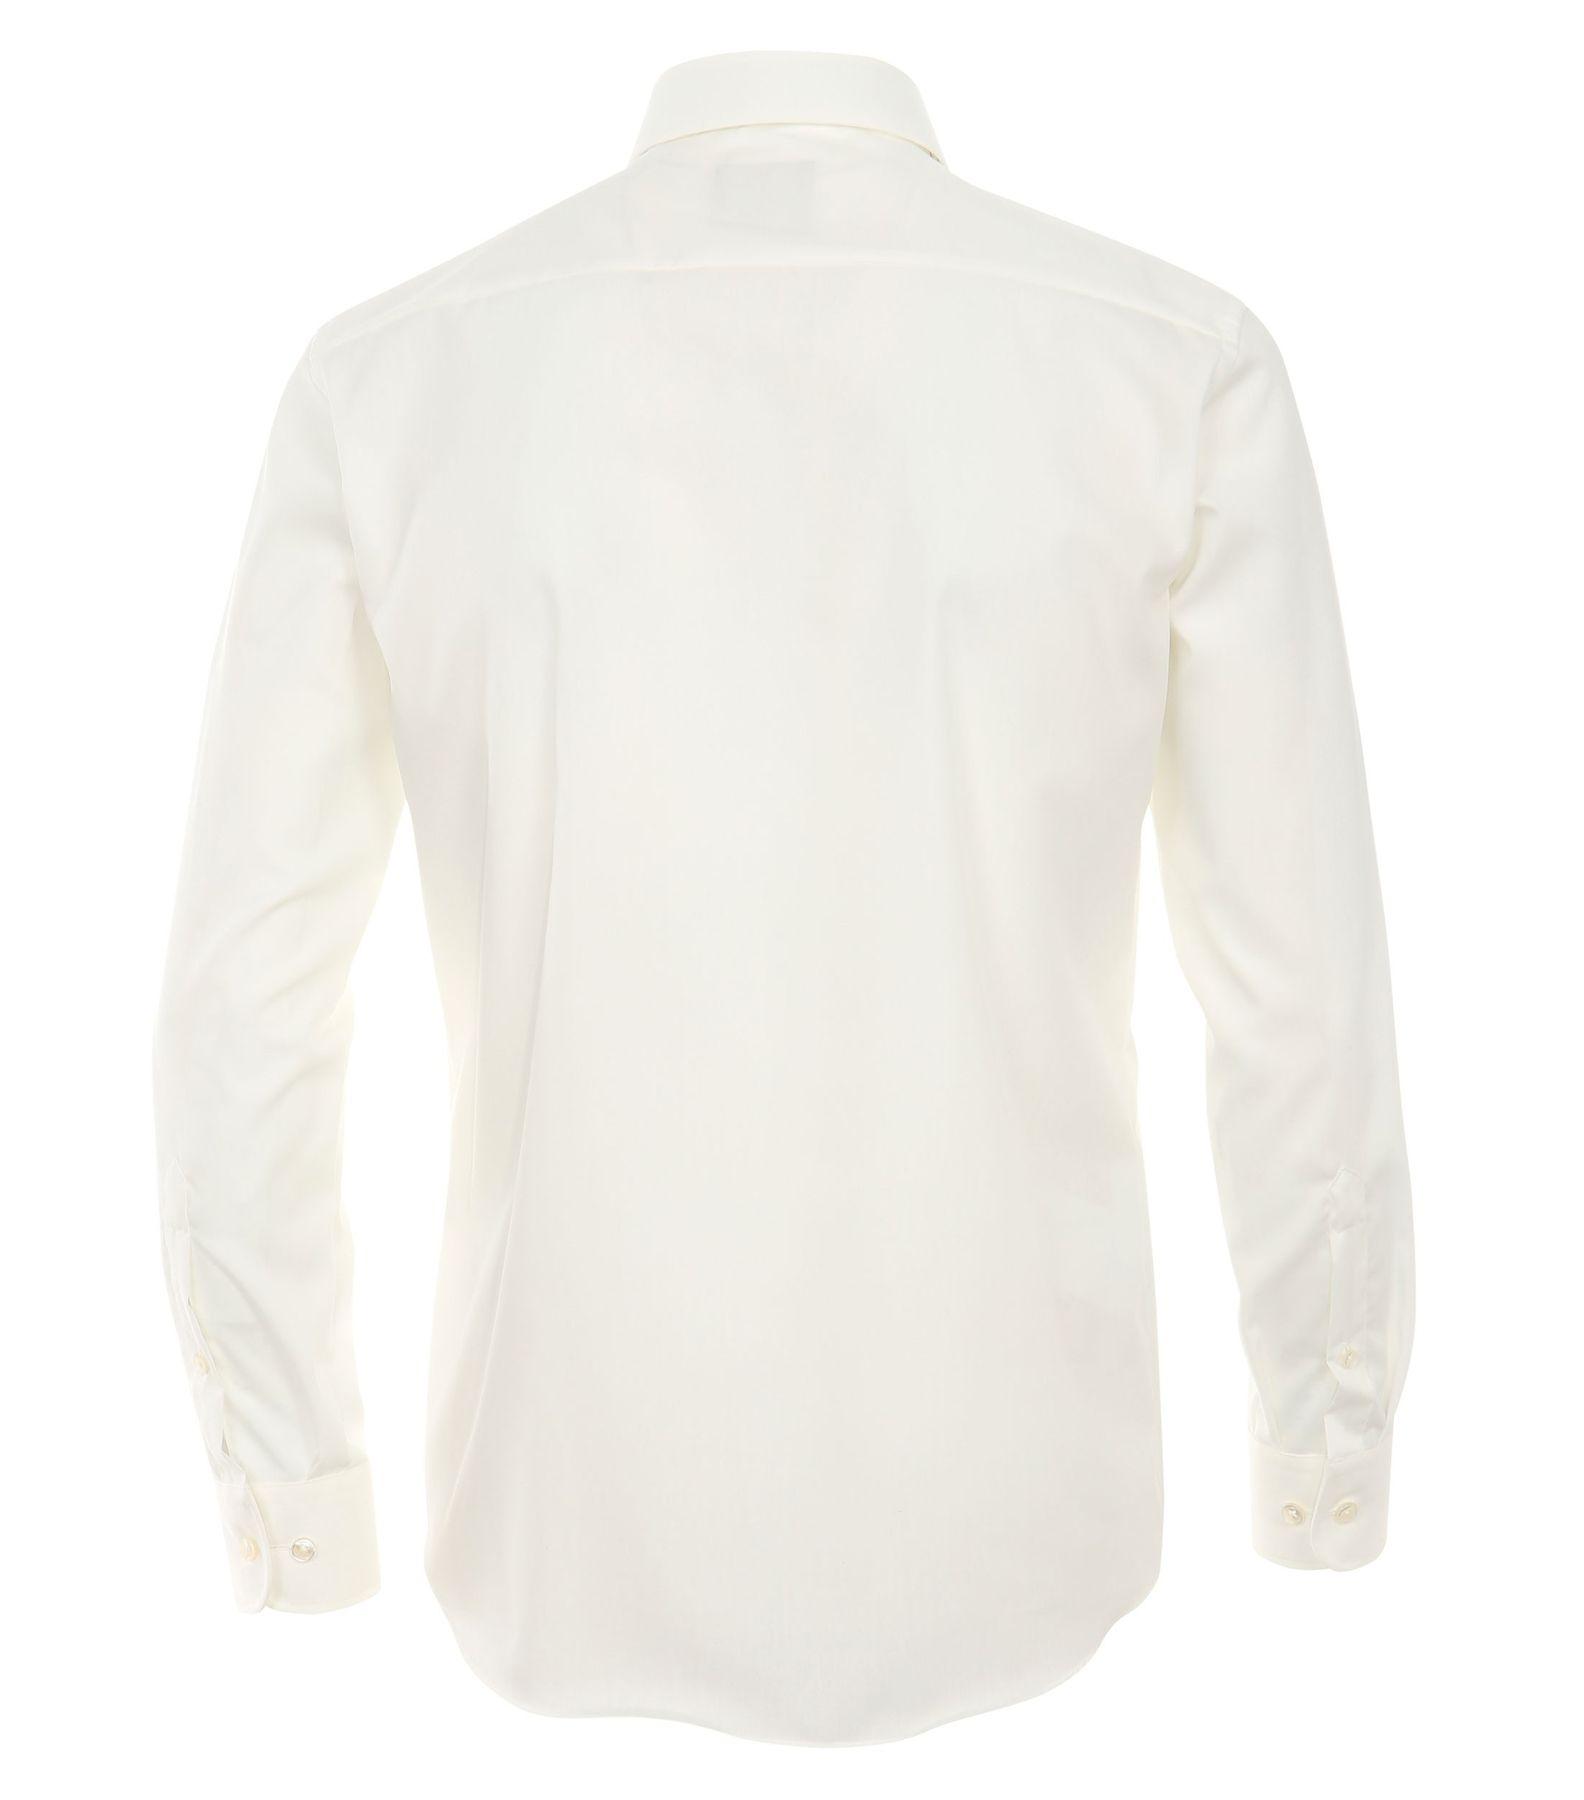 Casa Moda - Modern Fit - Bügelfreies Herren Business langarm Hemd in verschiedene Farben (006550) – Bild 17